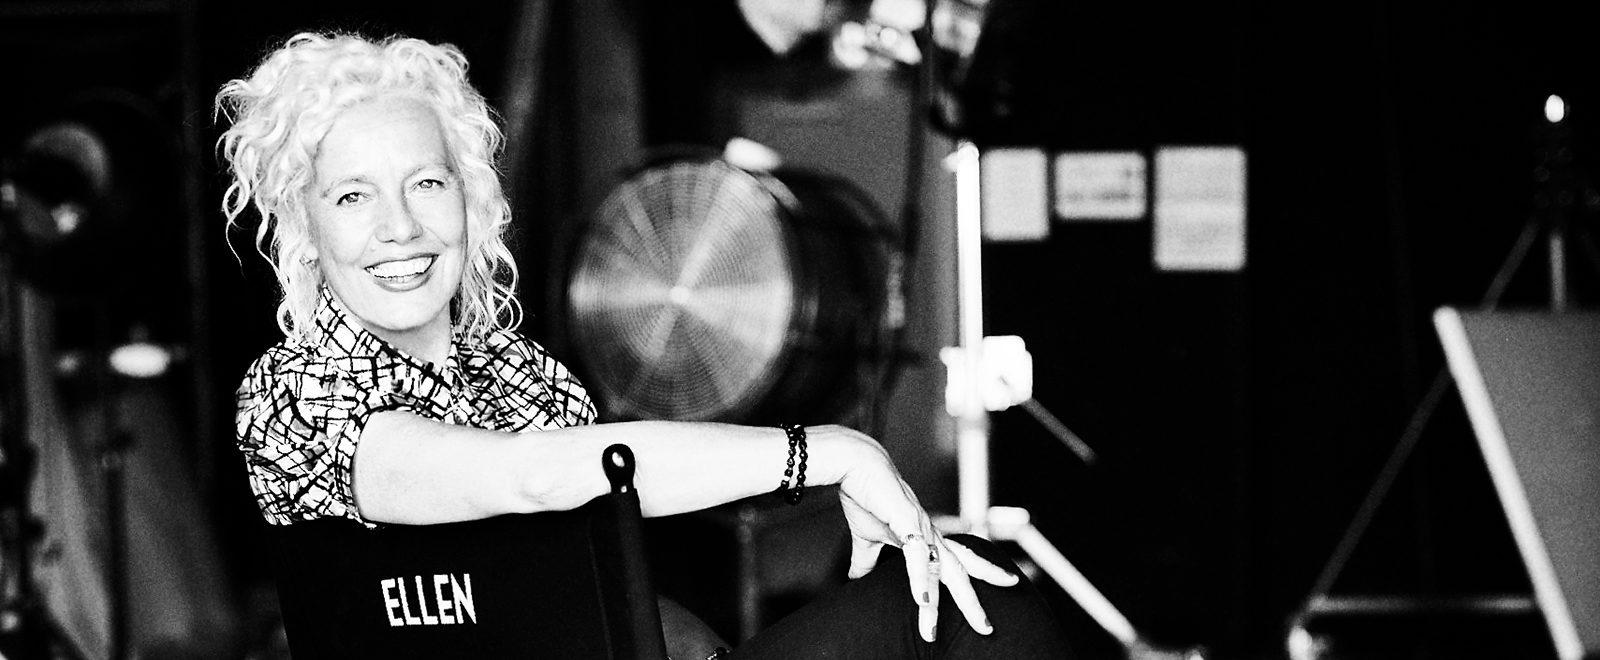 Ellen von Unwerth Janelle Fishman Interview Devotion! 30 years of photographing women Fotografiska Kate Moss Gisele Bündchen Naomi Campbell